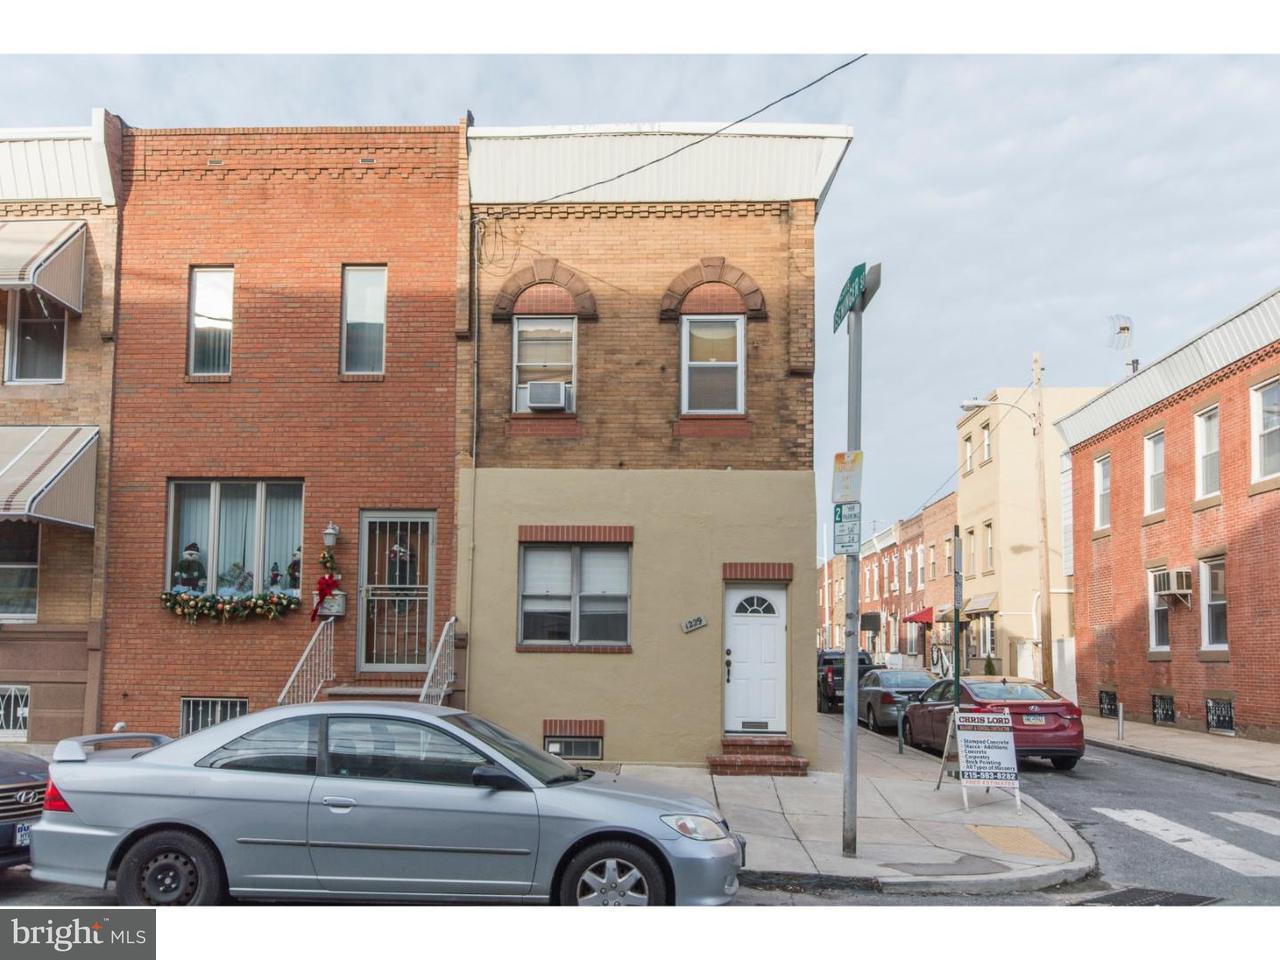 1229 W Porter Philadelphia, PA 19148